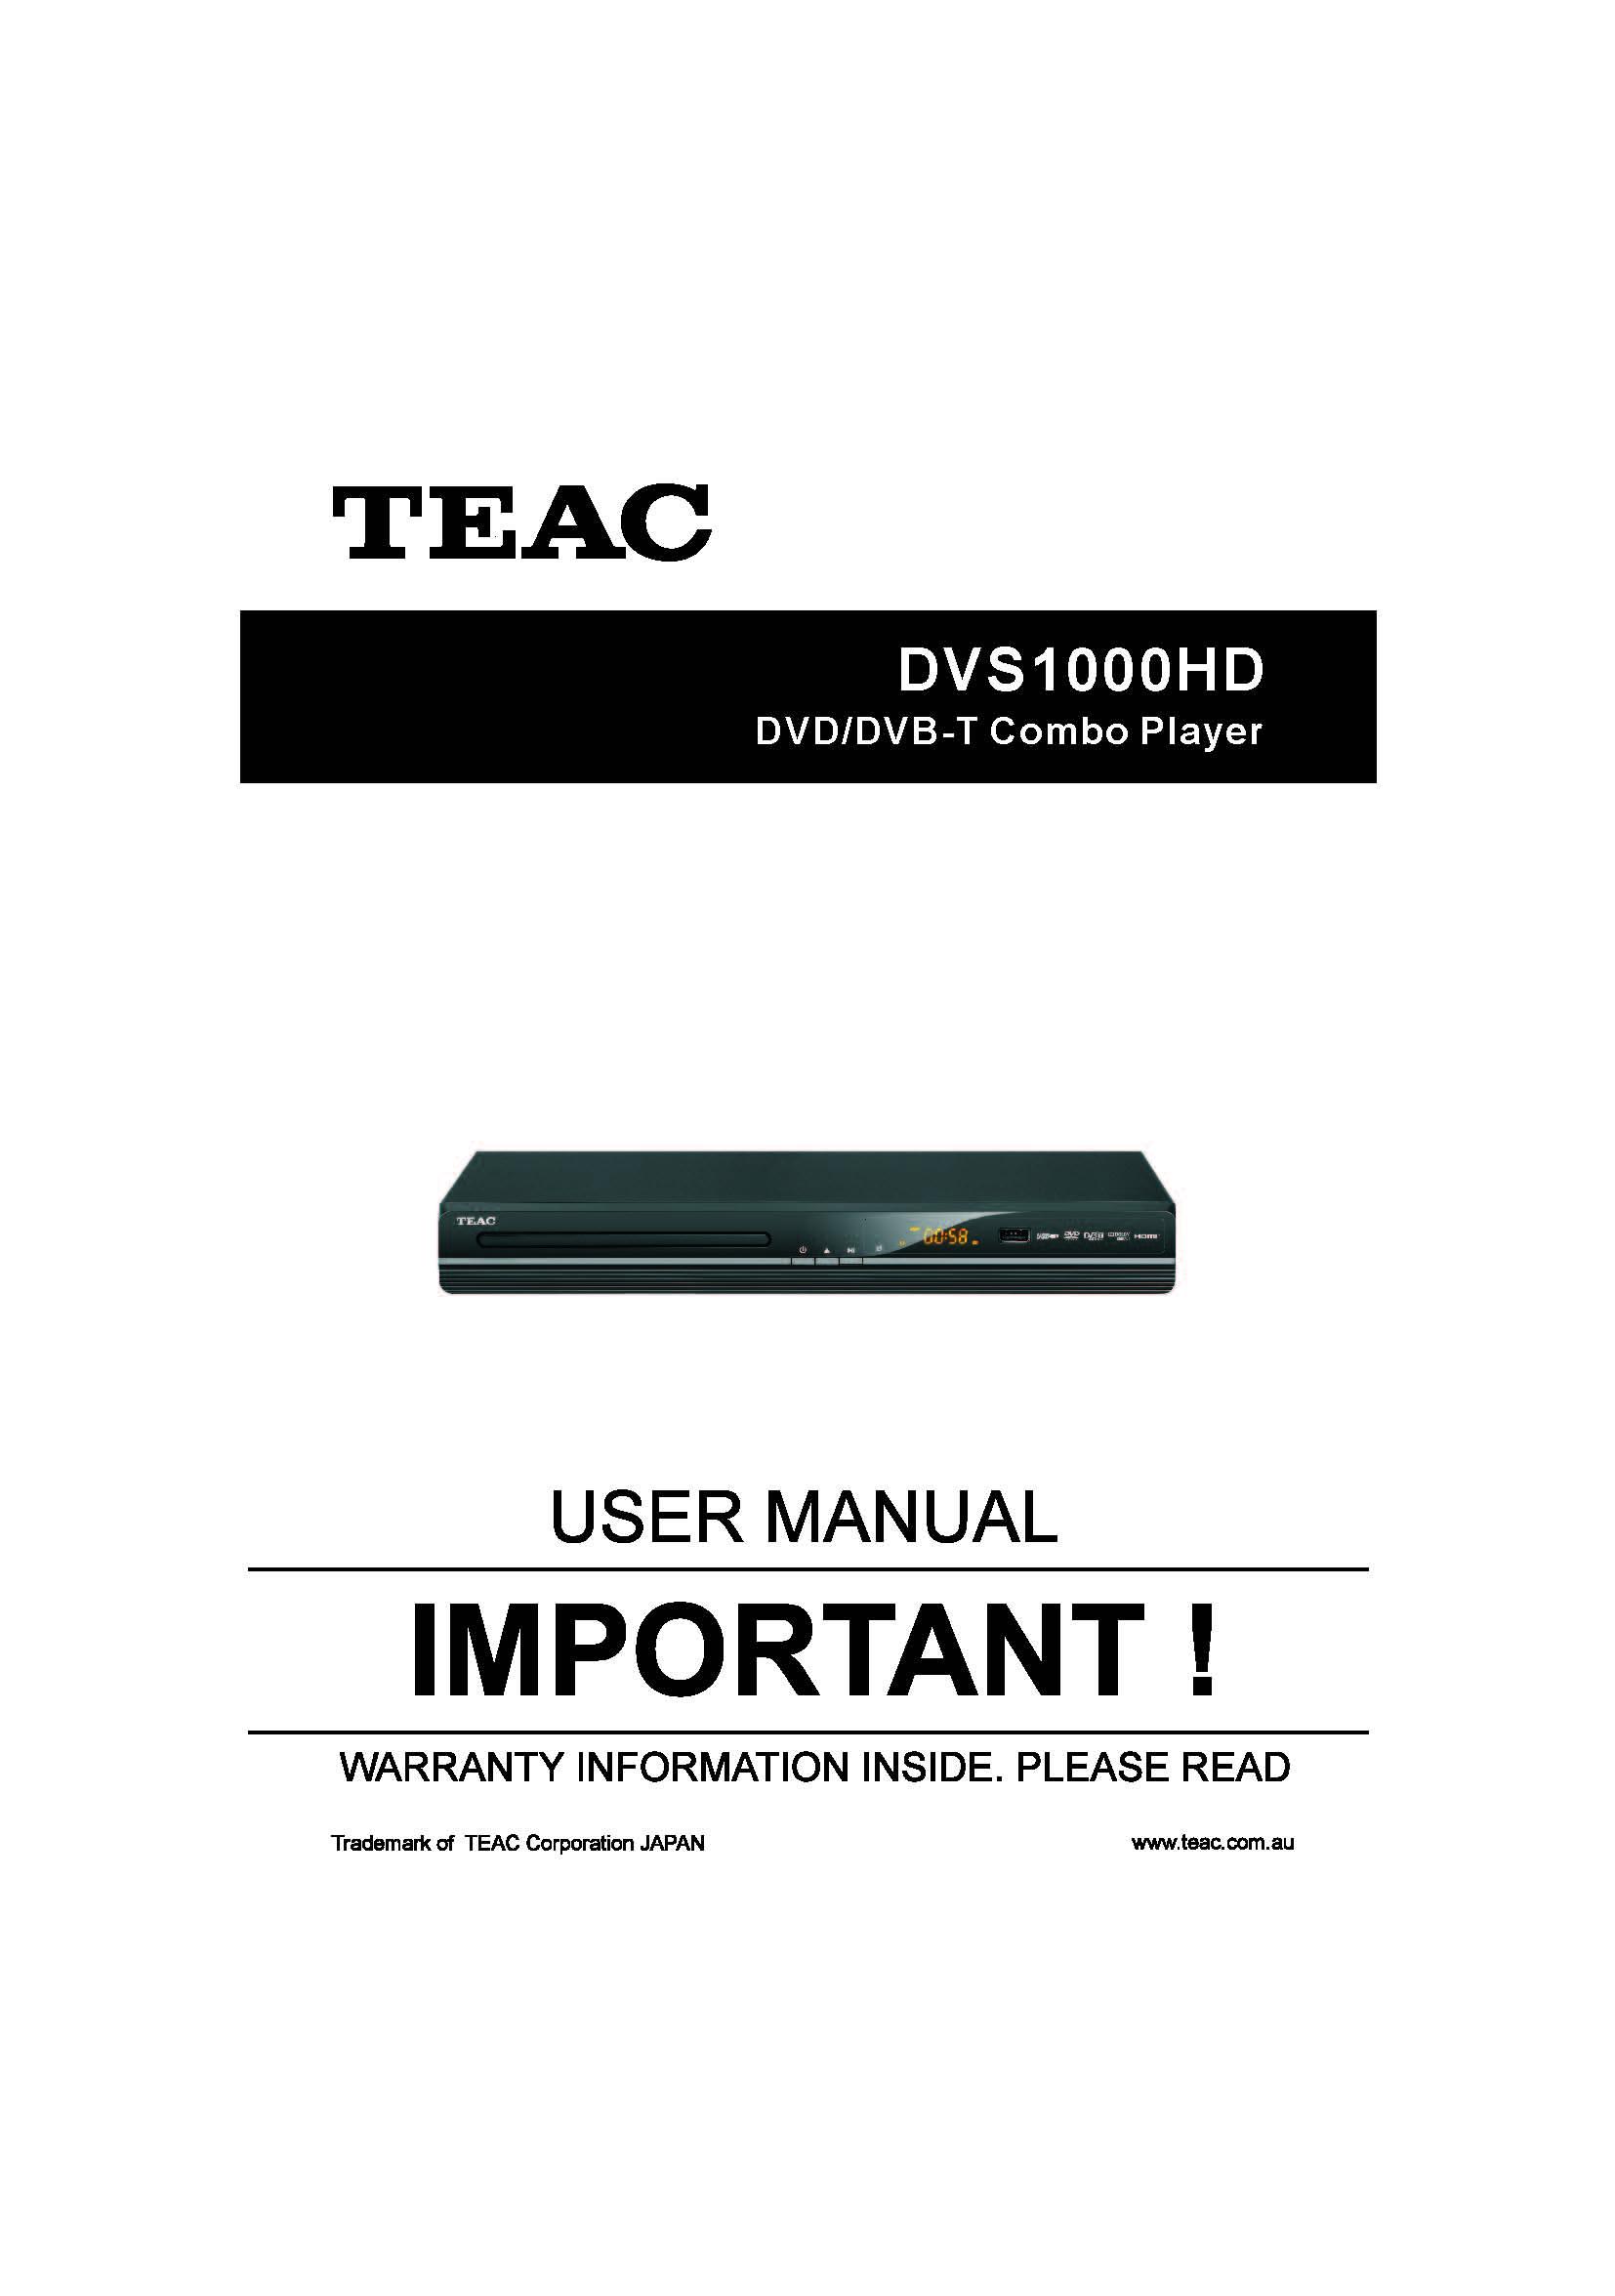 teac dvs1000hd user manual store809 rh store809 com TEAC an 80 User Manual TEAC Manual Operation